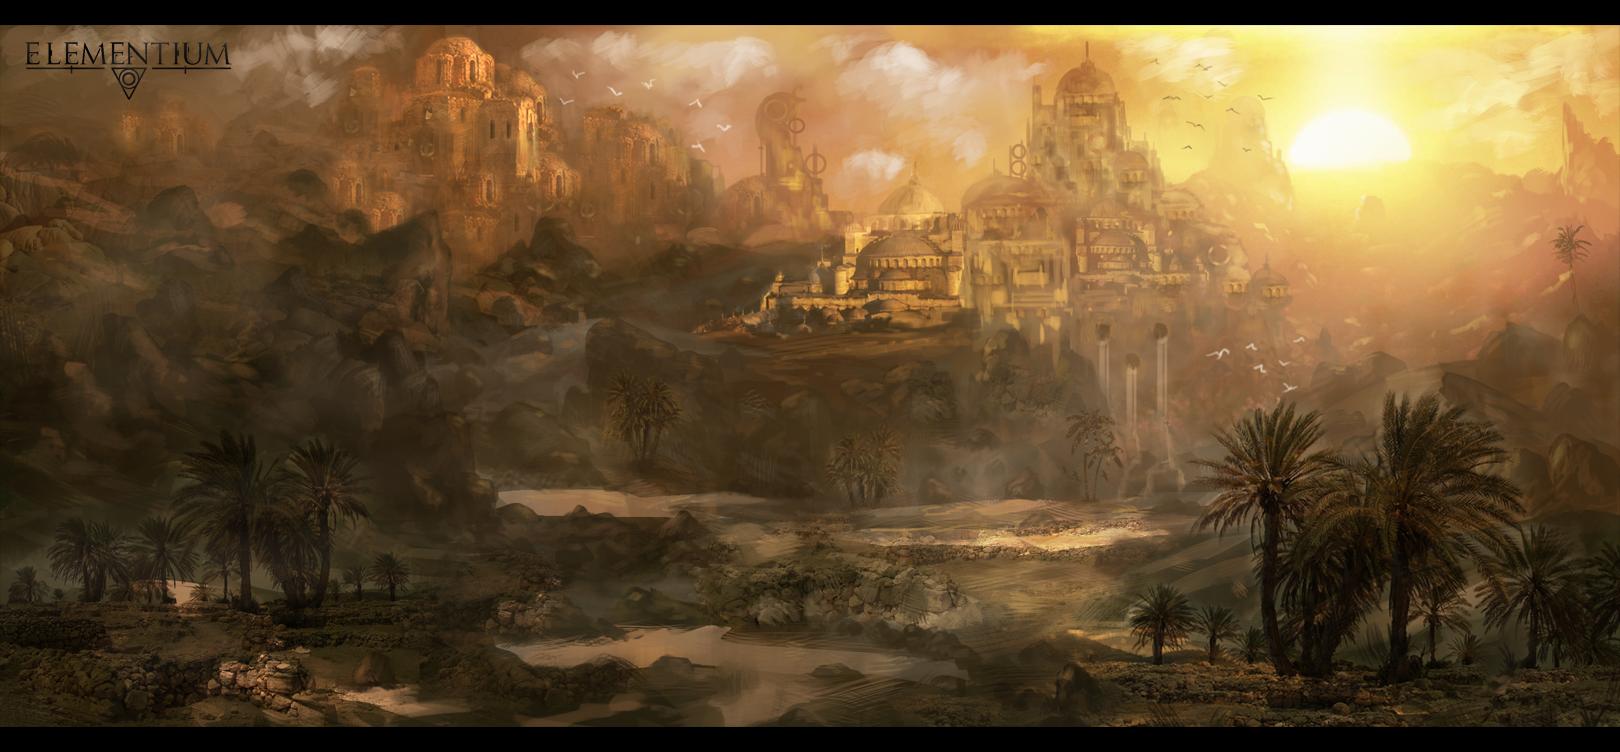 Project Elementium - Saradim Desert by Narandel